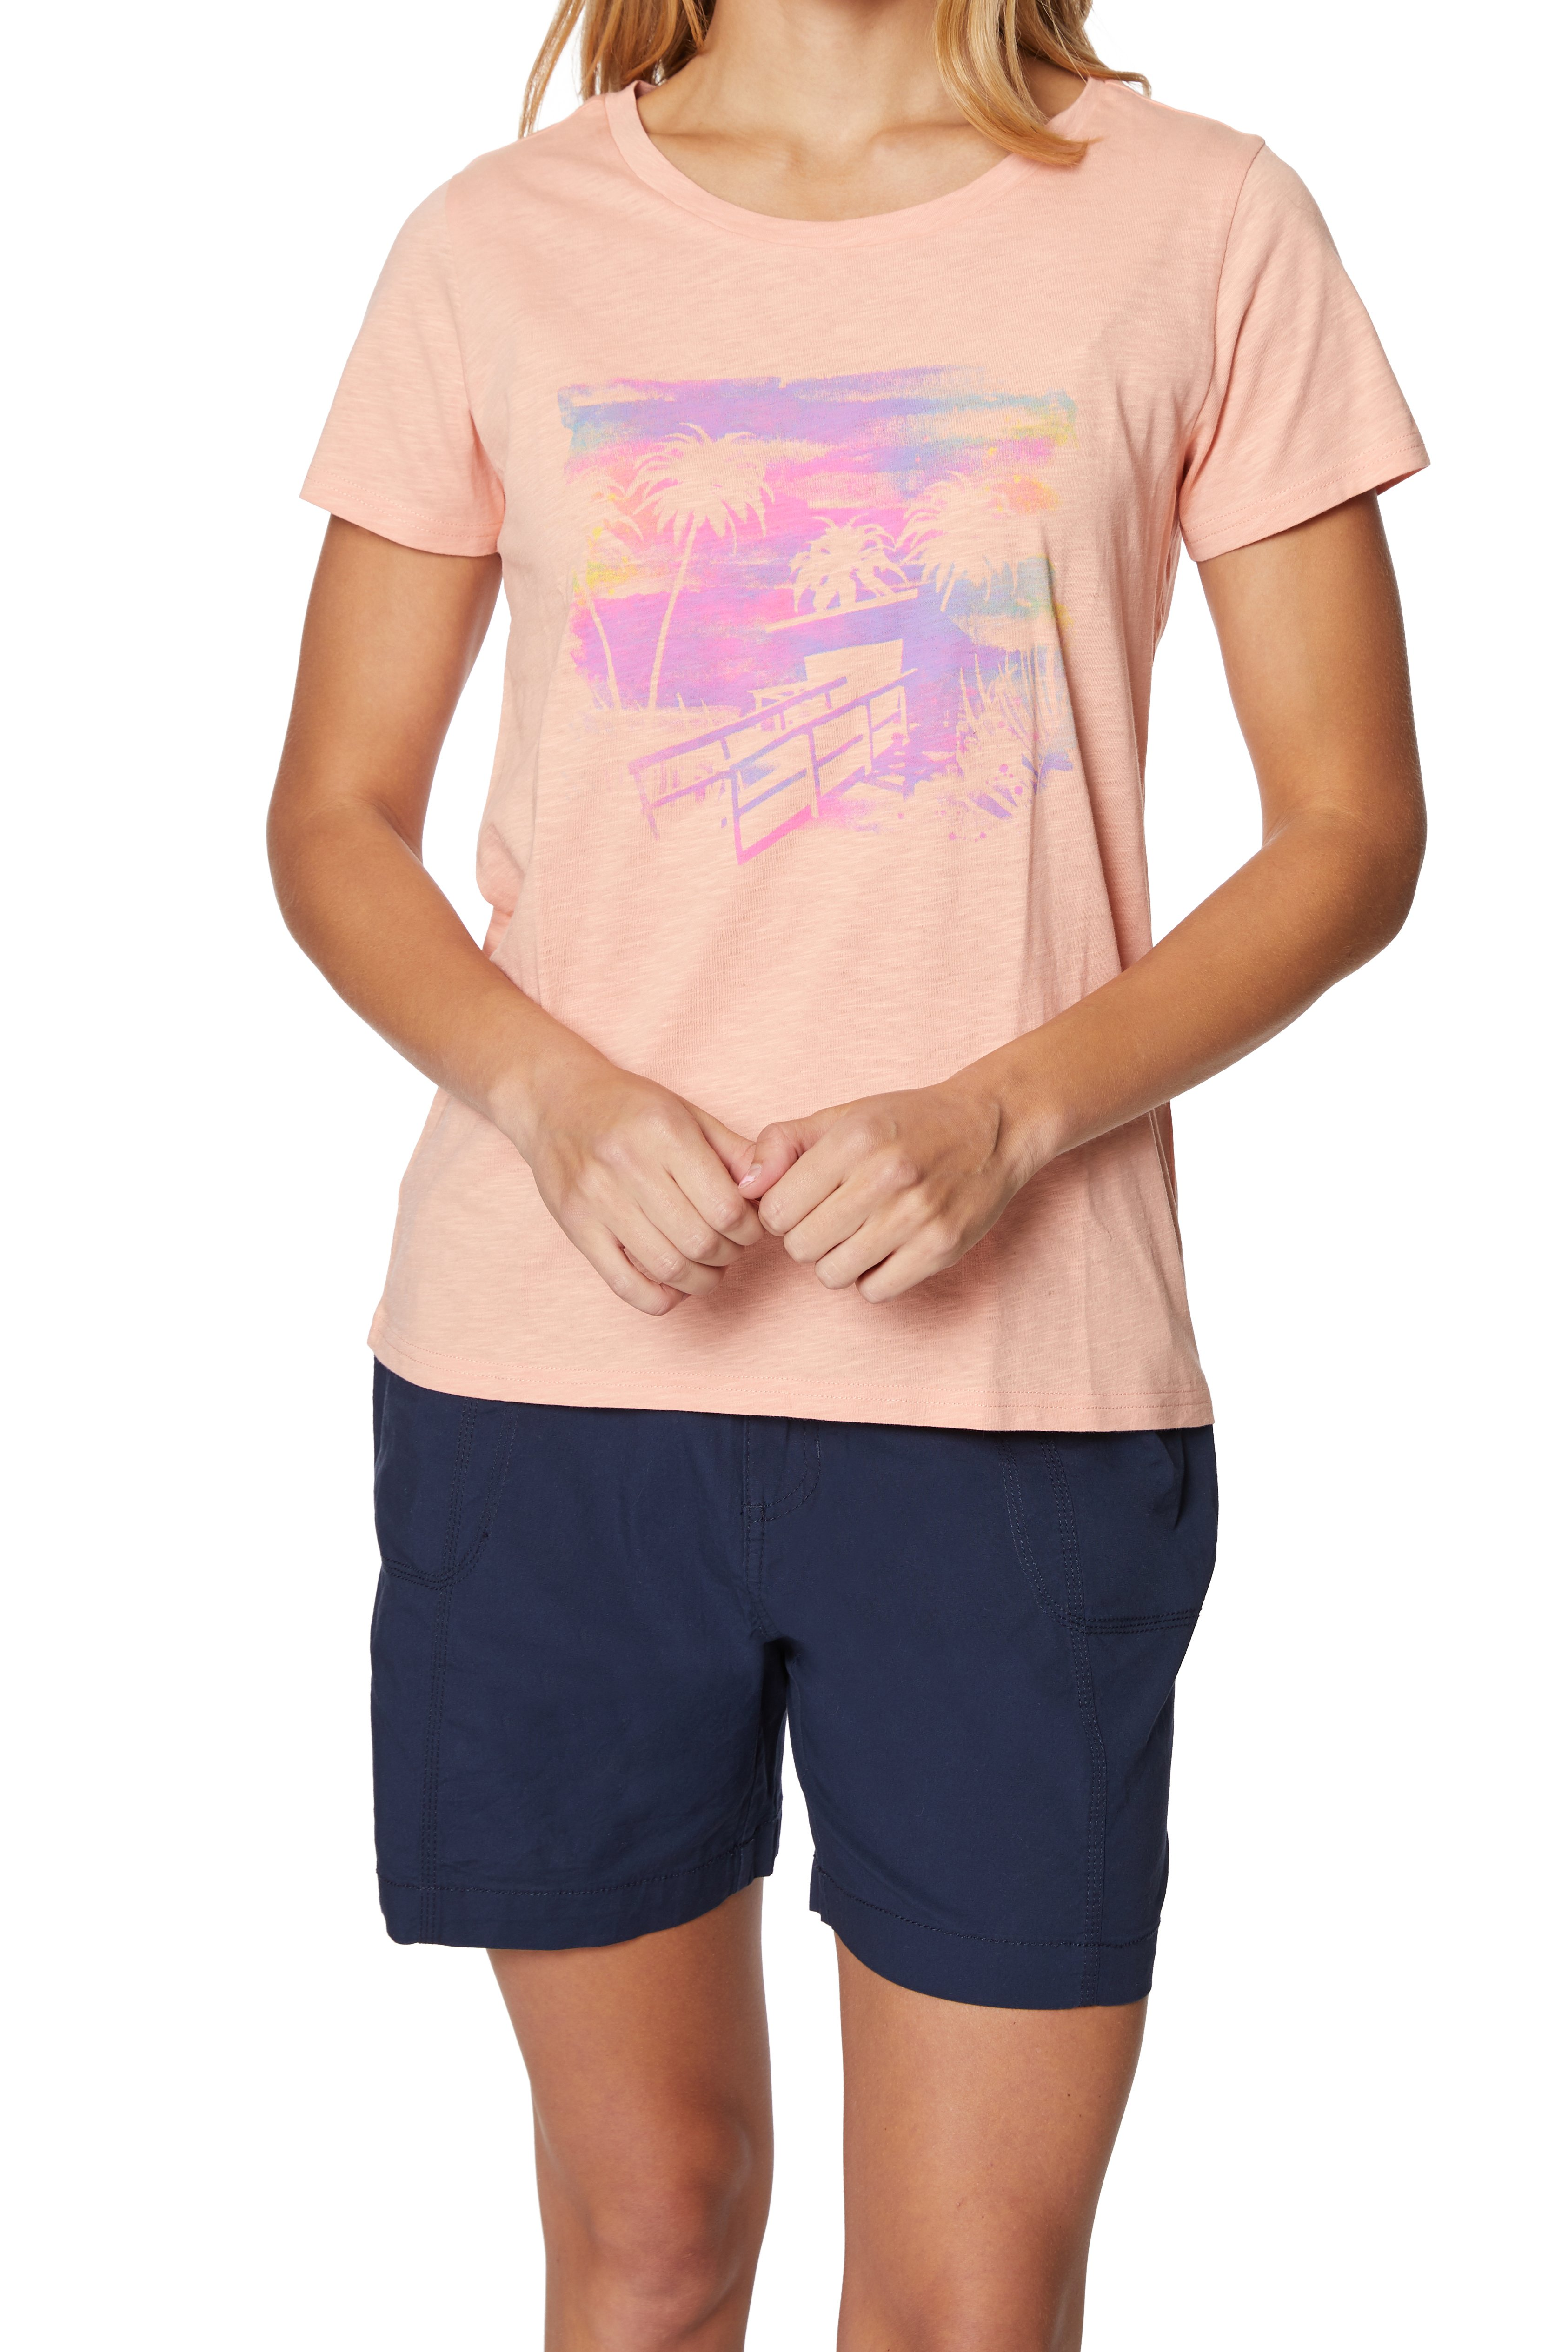 Caribbean Joe® Screen Print Knit T-Shirt -Soft Blush - Front